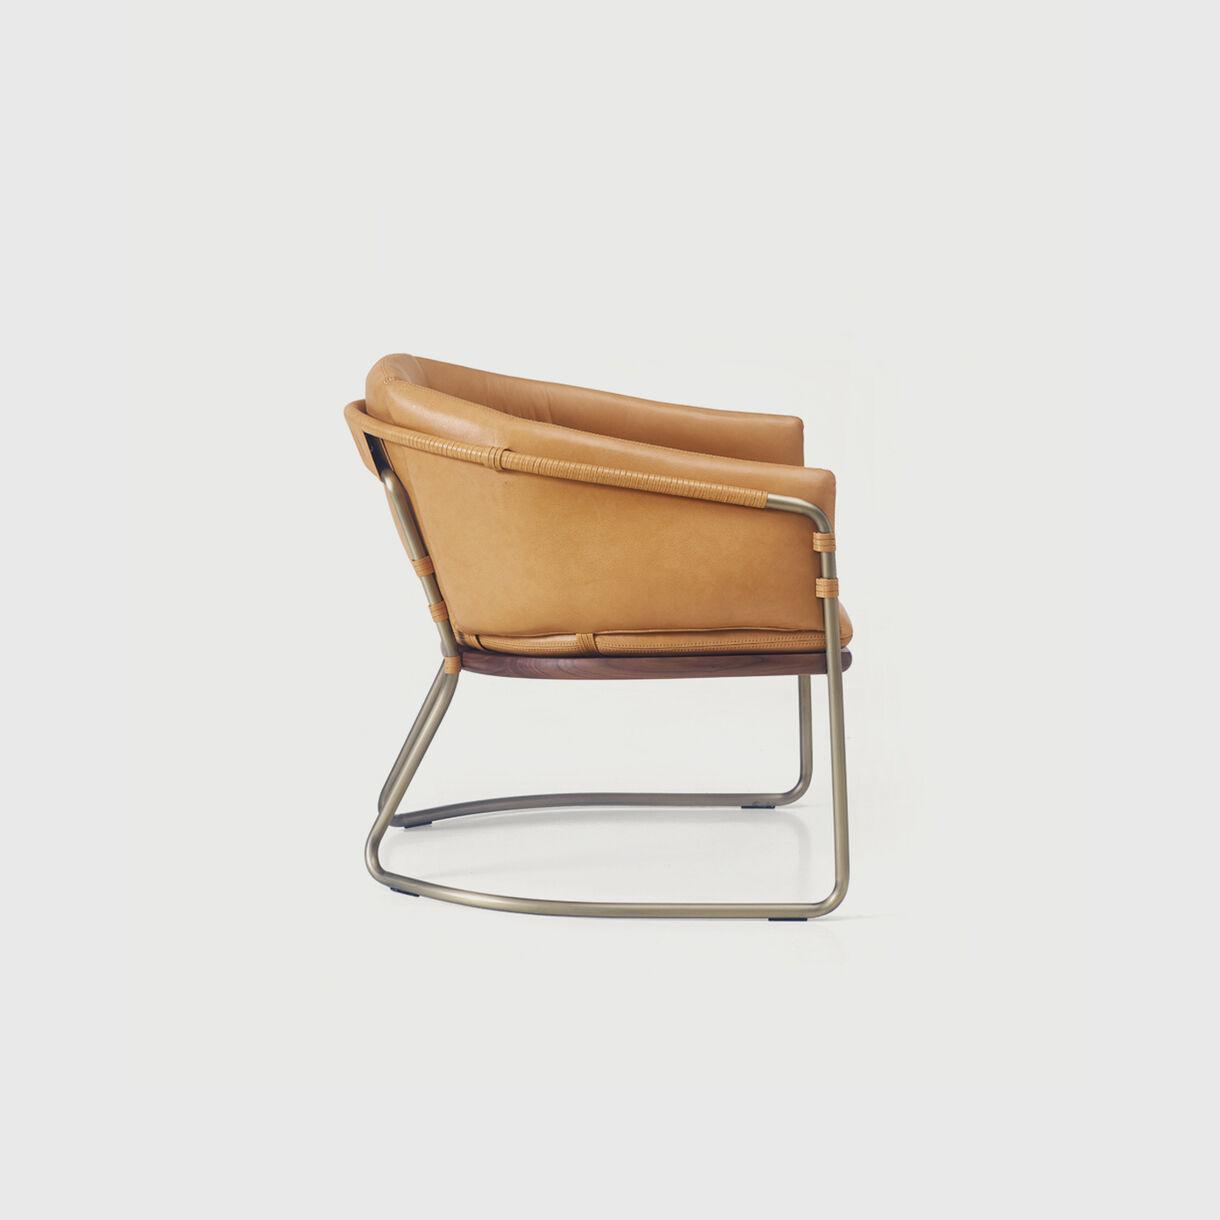 Geometric Armchair in Leather